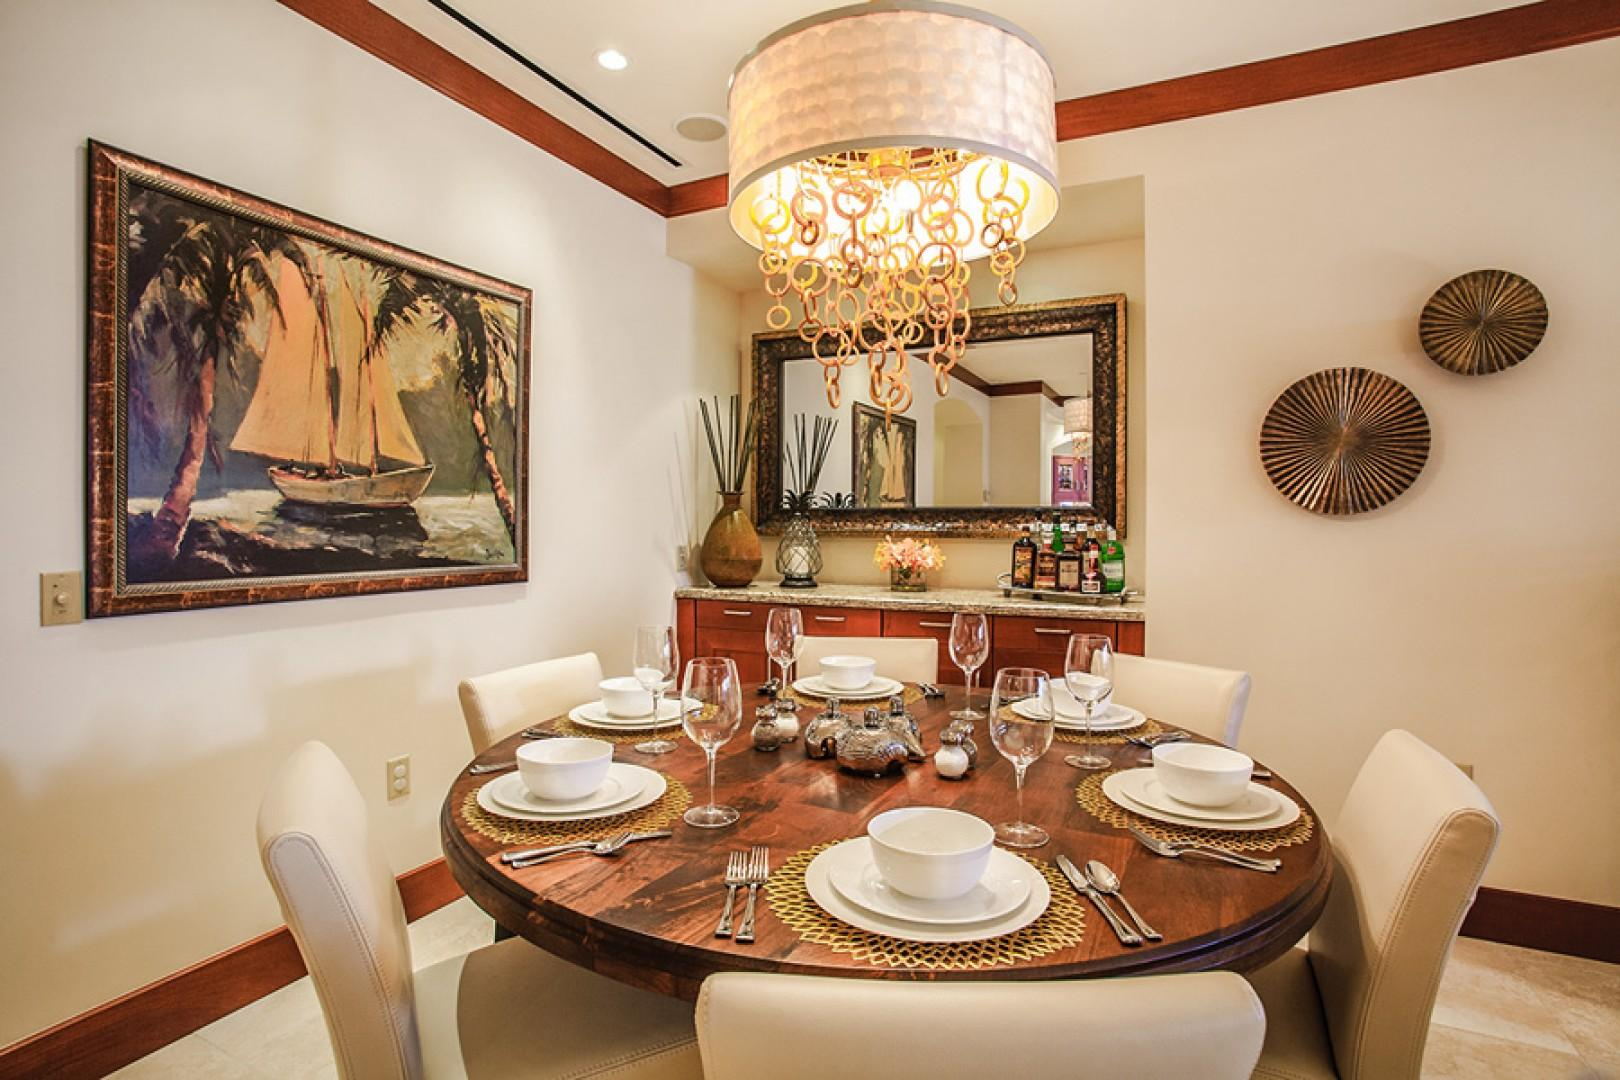 Enjoy elegant meals with bone china and crystal glassware.